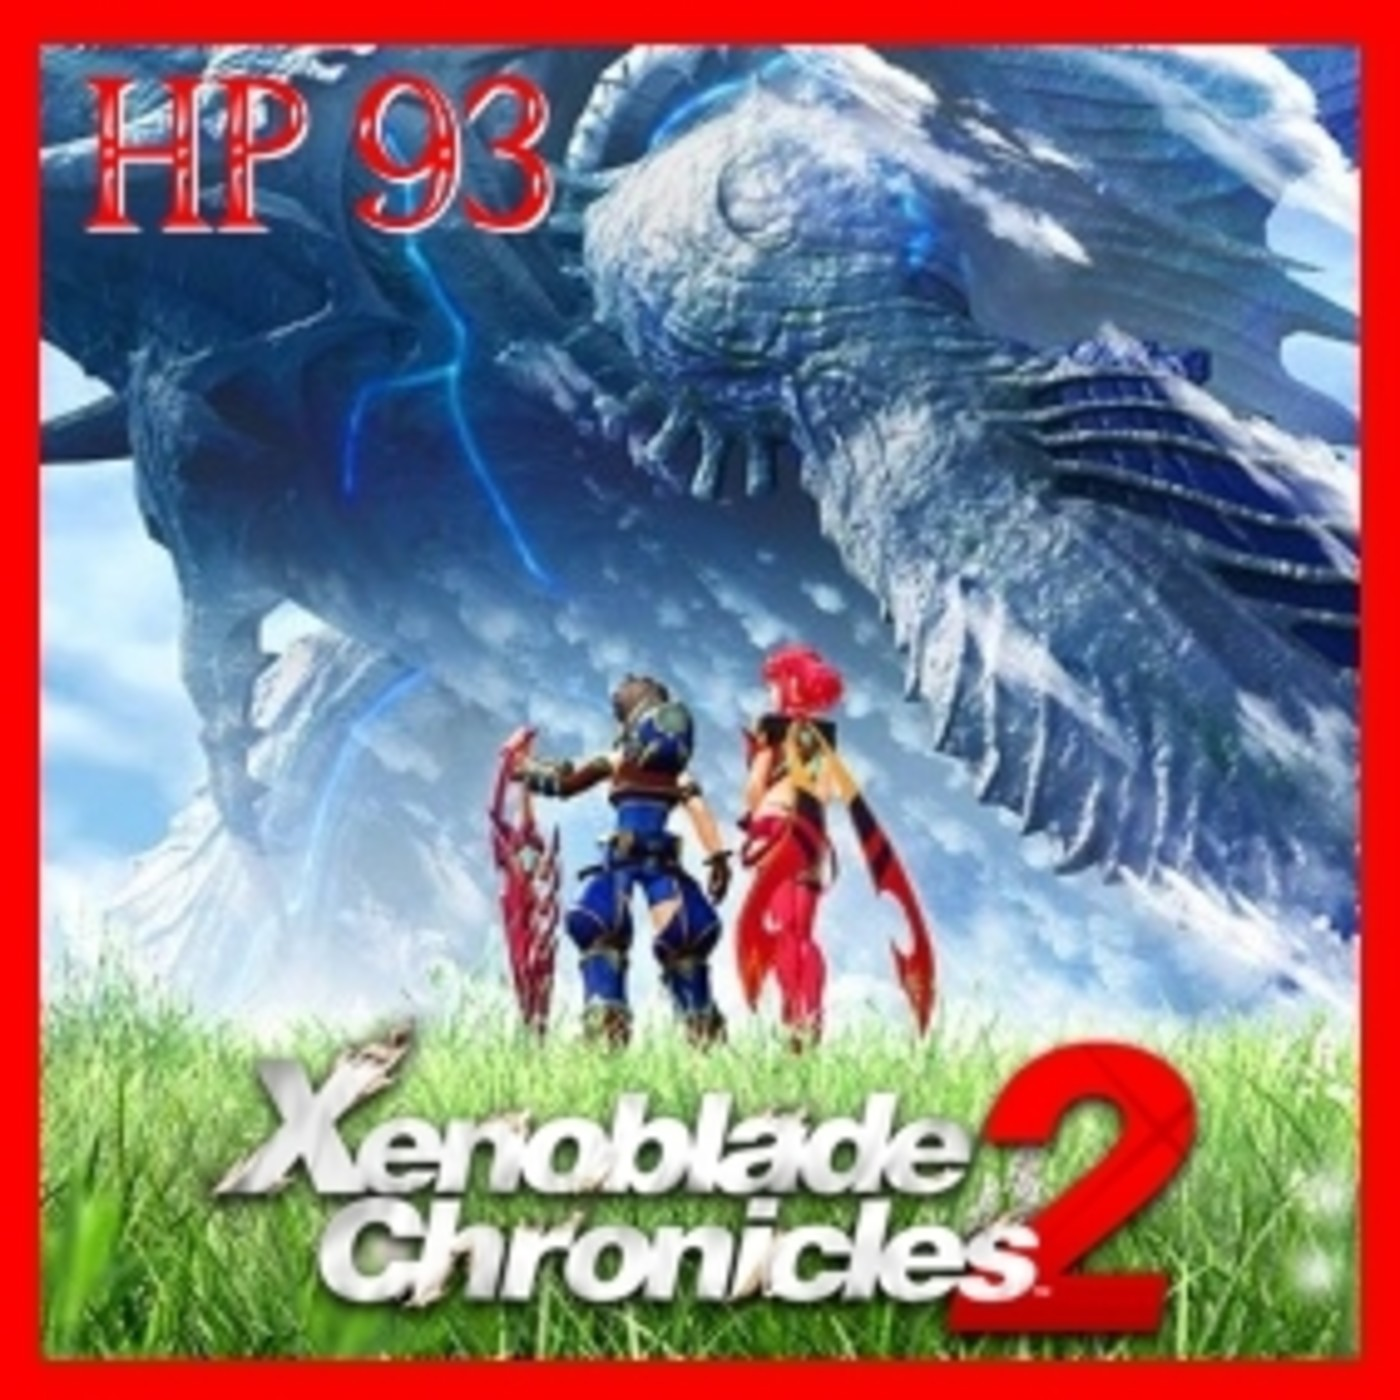 Hyrule Project Episodio 93: Nintendo Direct Mini & Xenoblade Chronicles 2